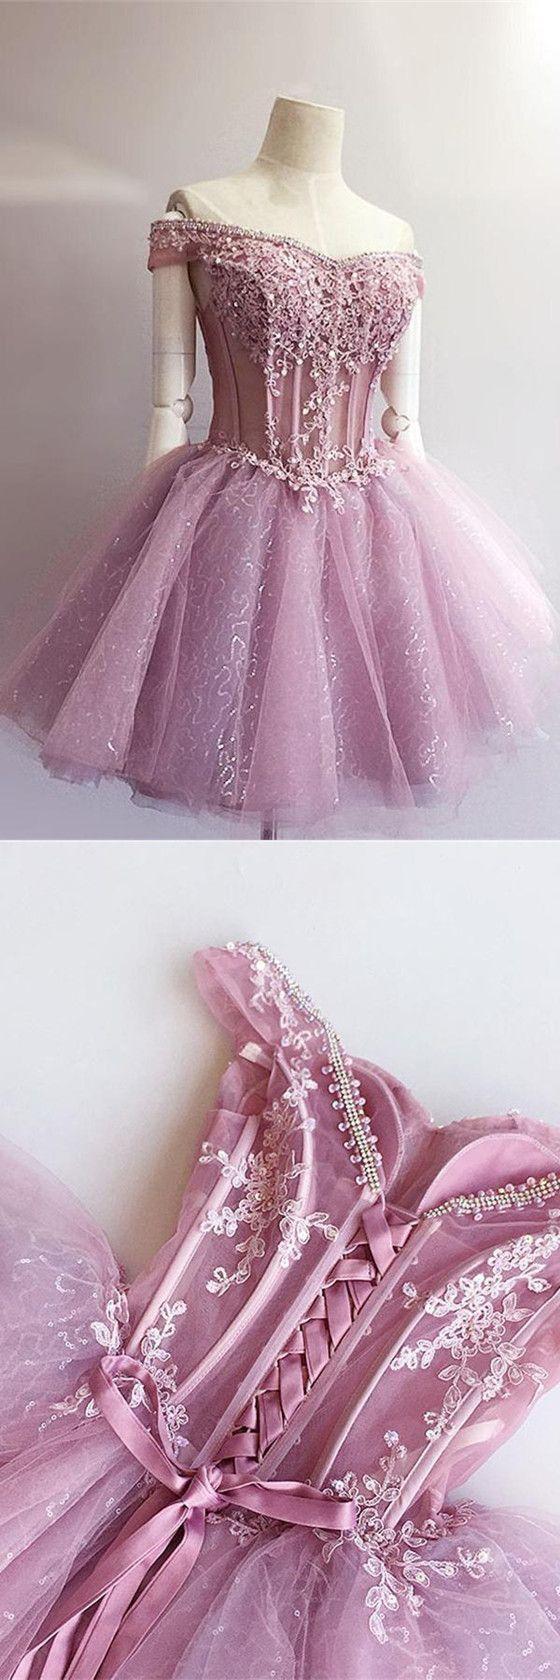 Charming aline offshoulder lace appliques short homecoming dresses